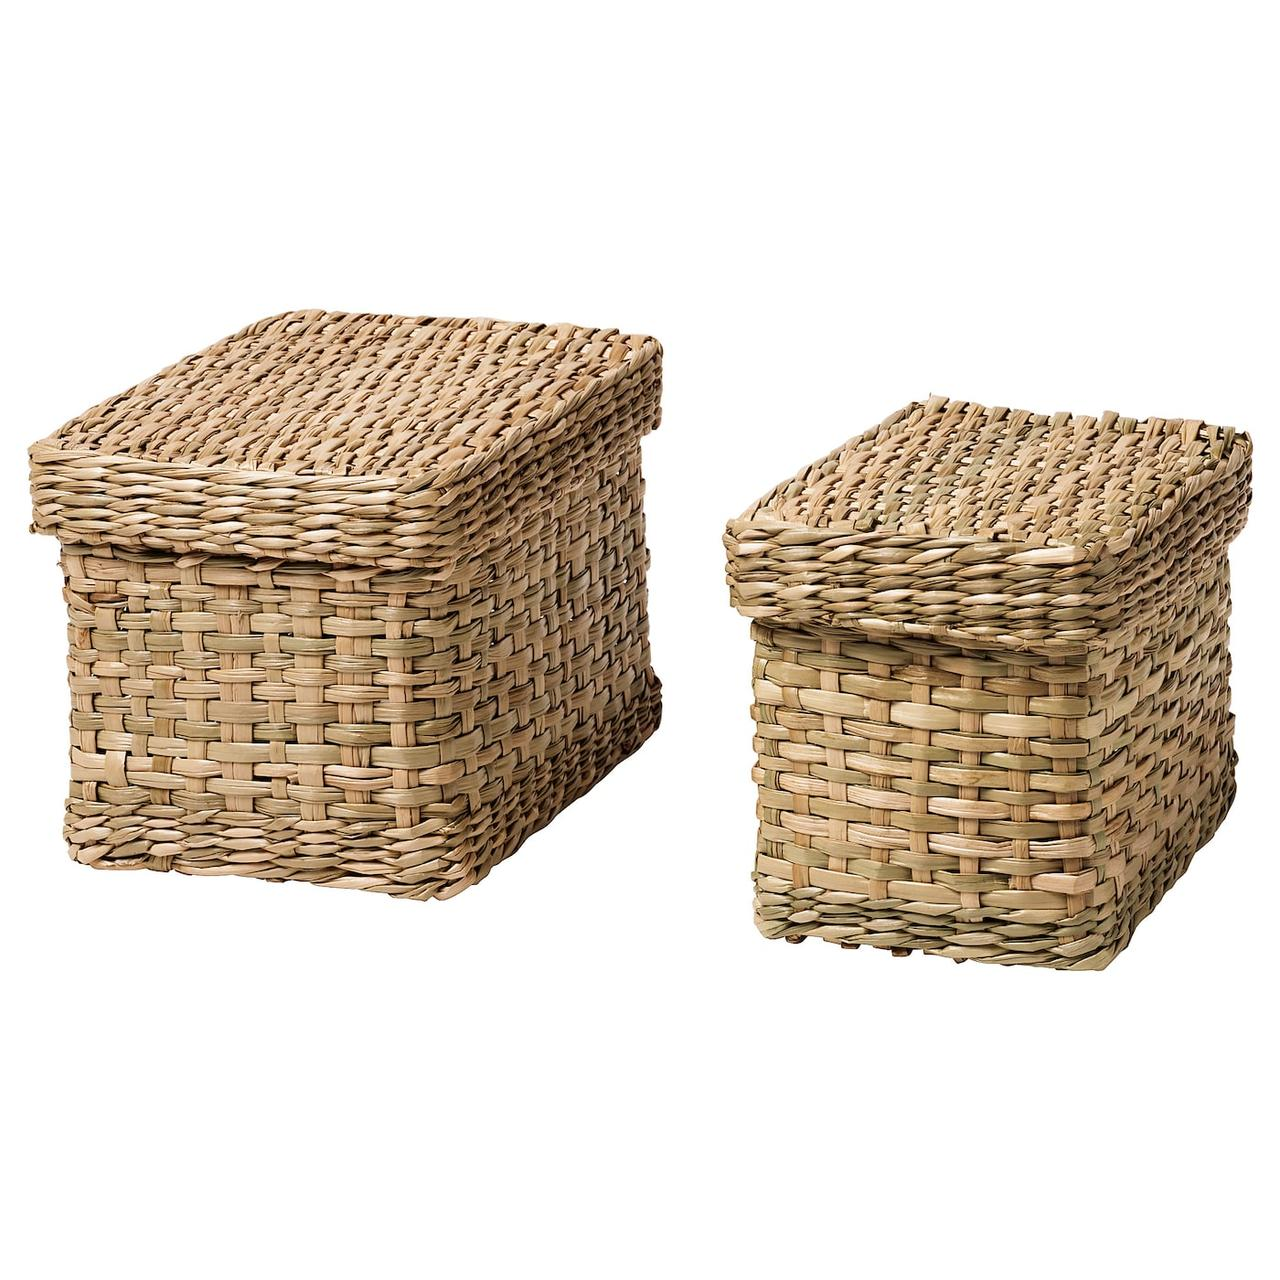 IKEA LURPASSA Коробка с крышкой 2 шт., морская трава